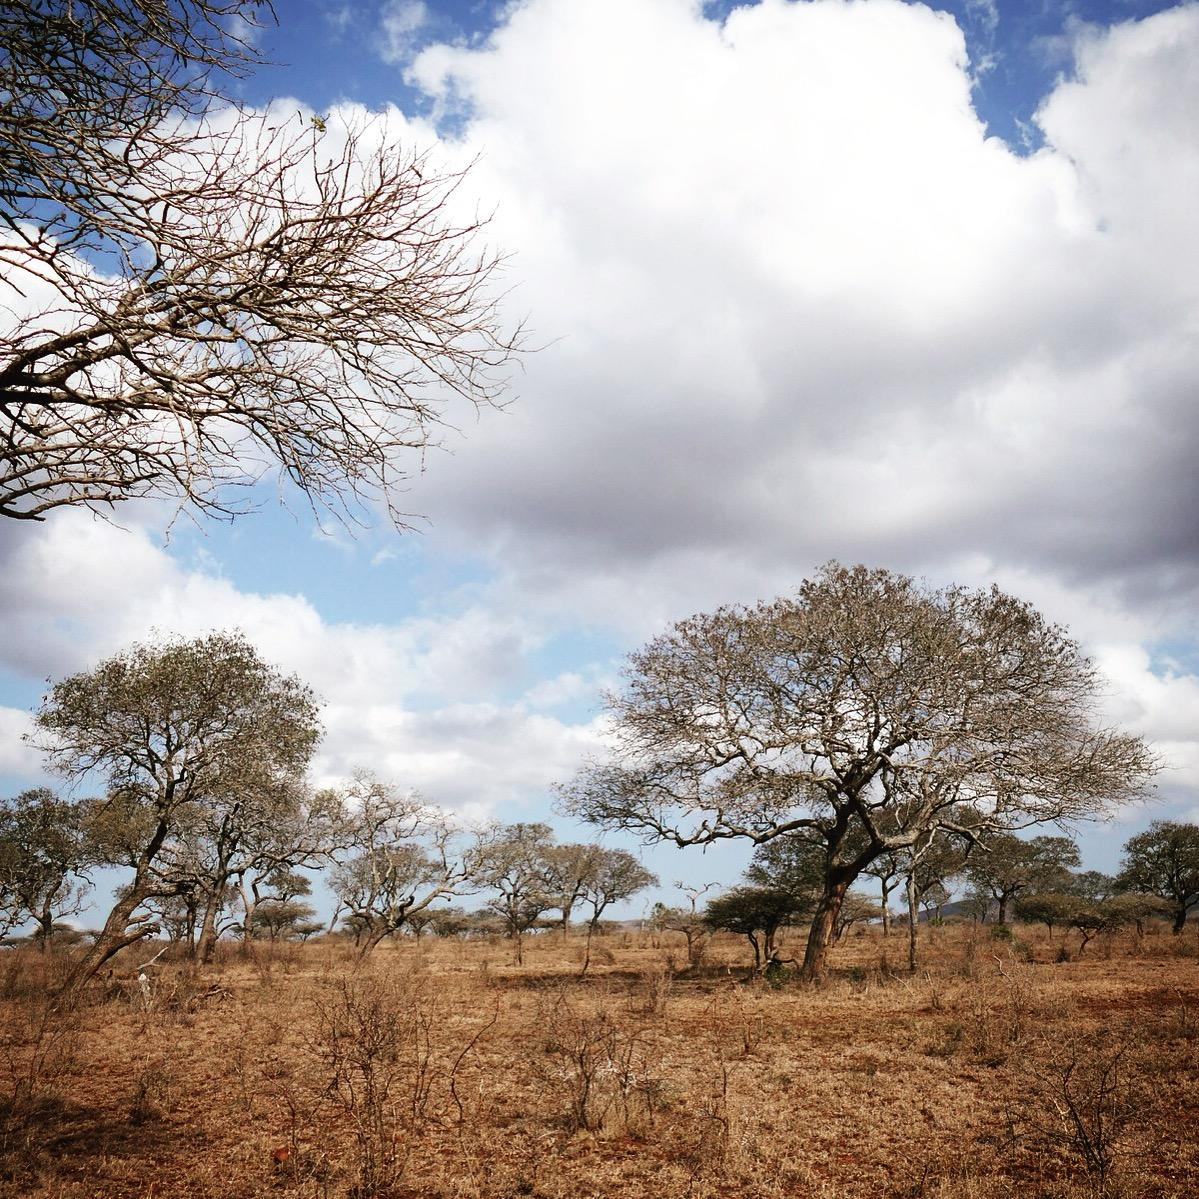 Dry forest at Mkhuze Game Reserve. Noah Strycker